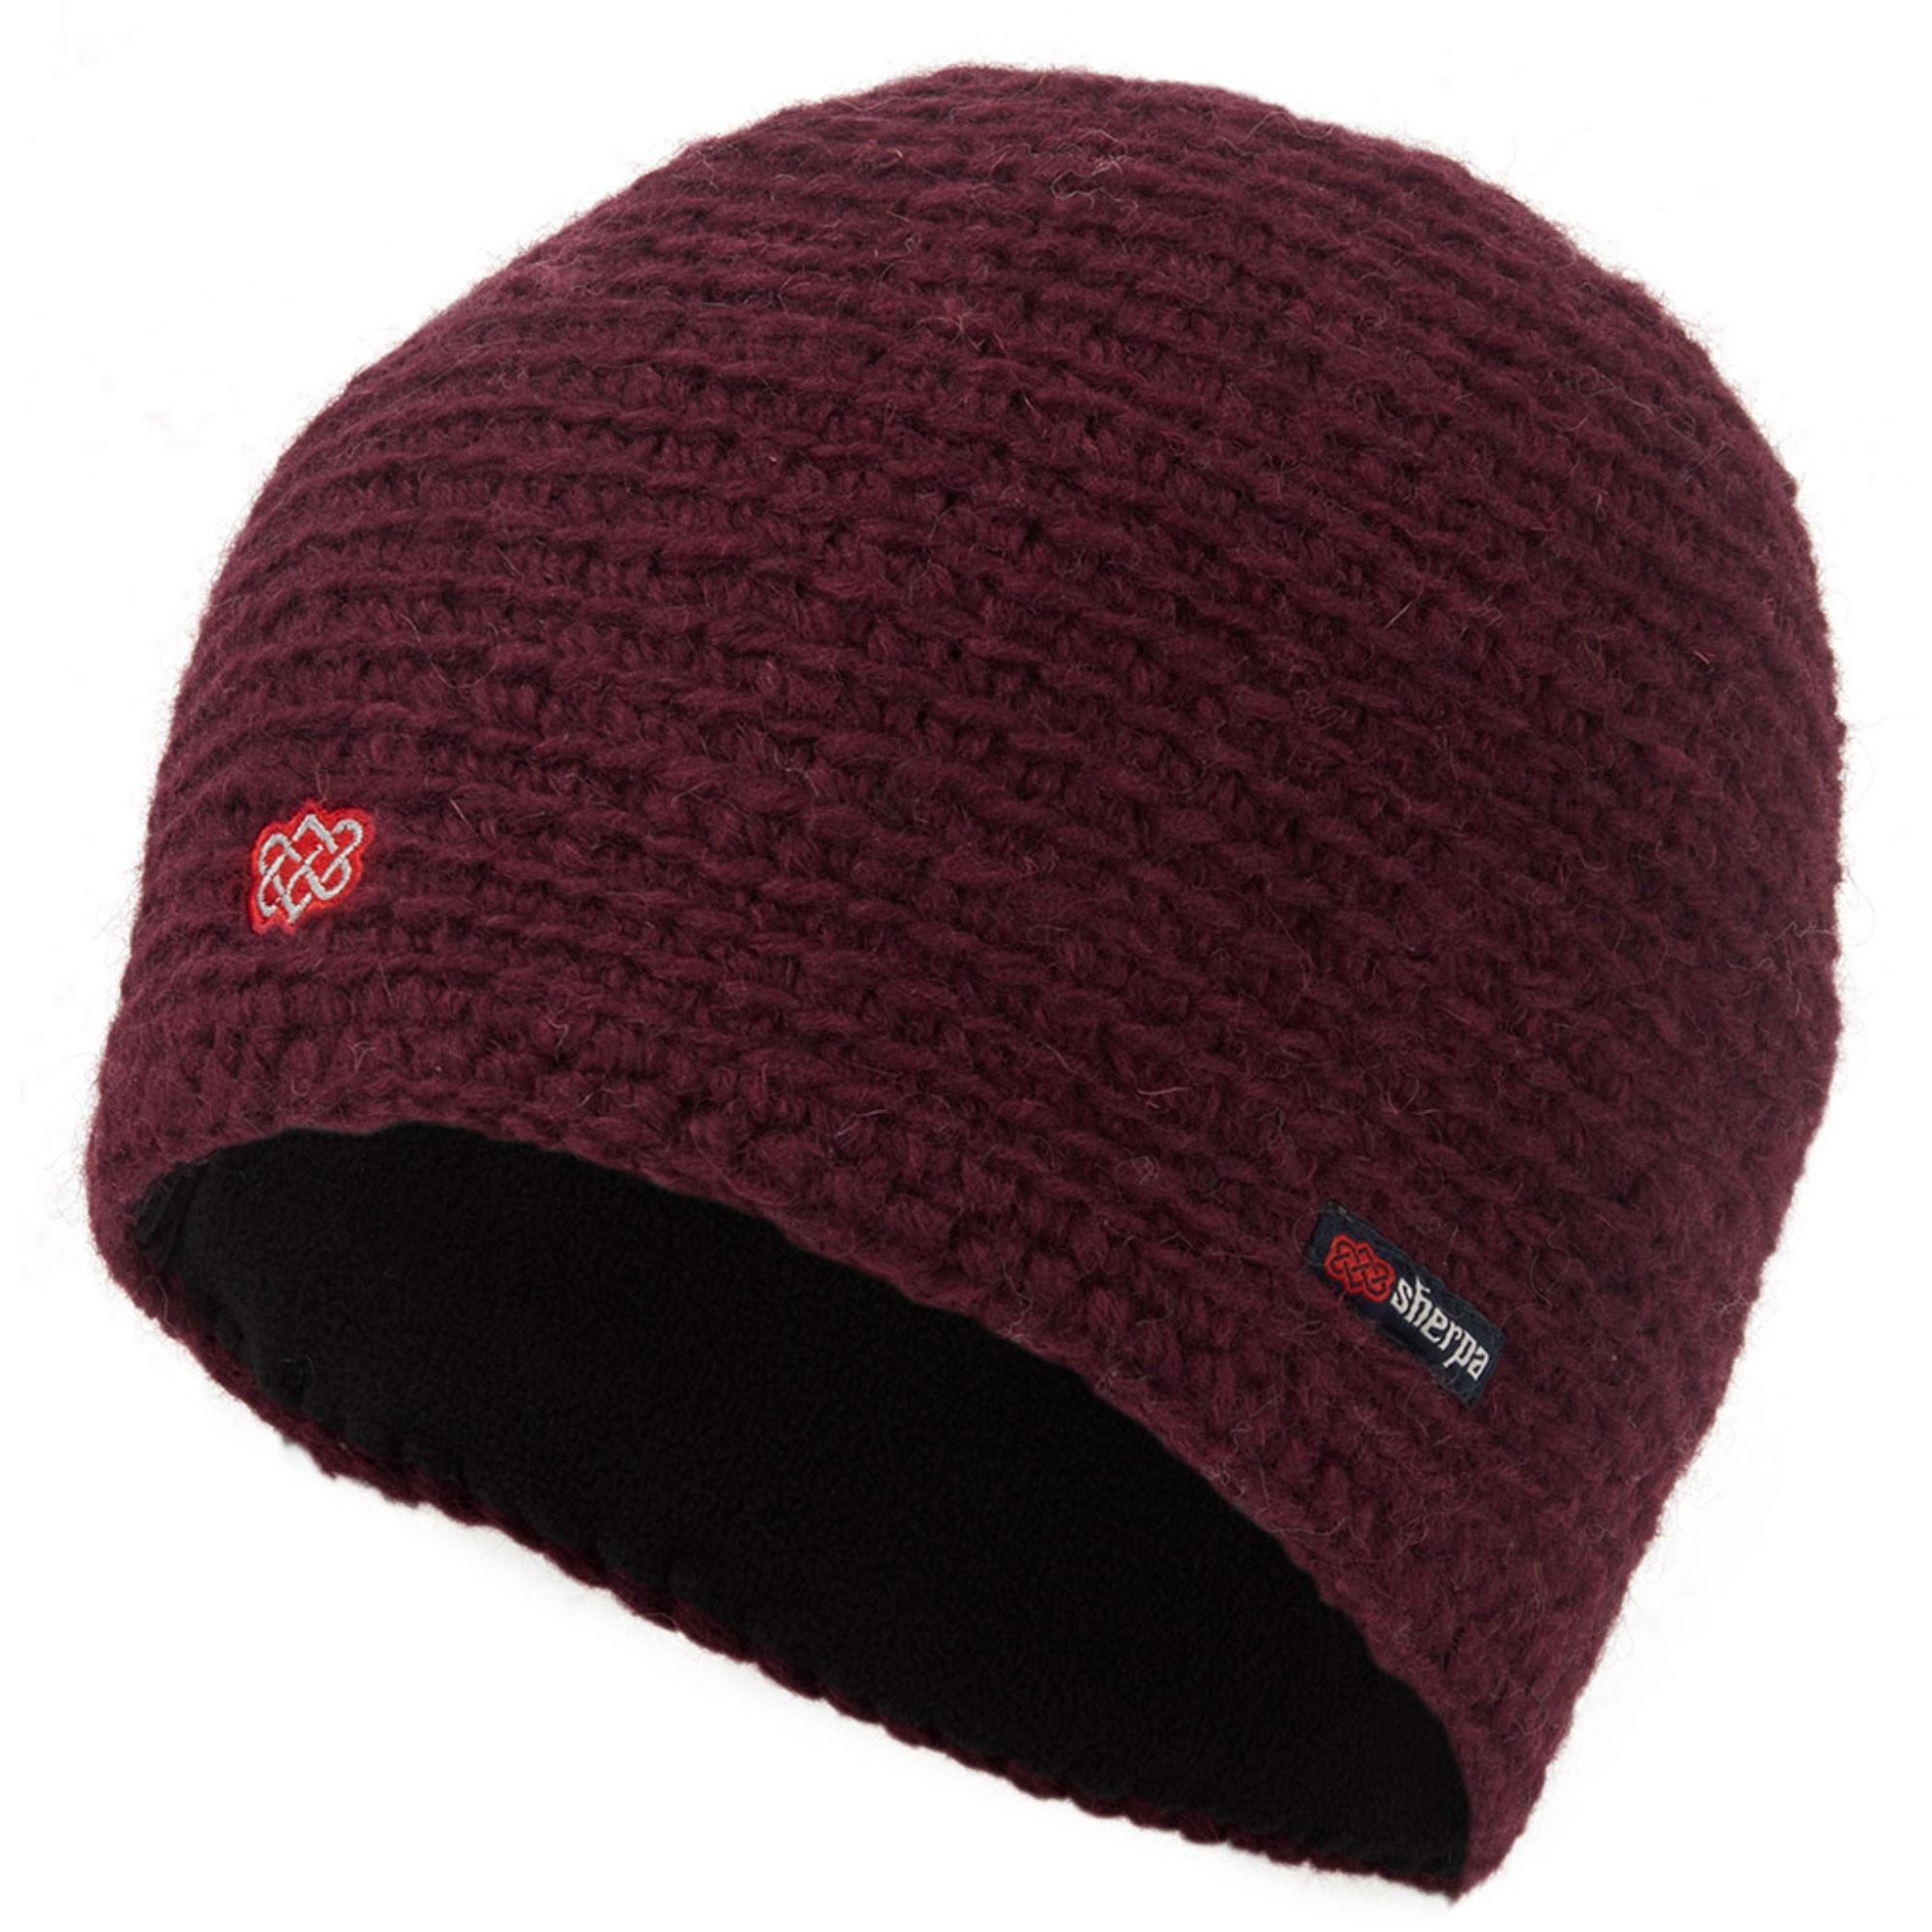 Sherpa Jumla Hat - Anaar